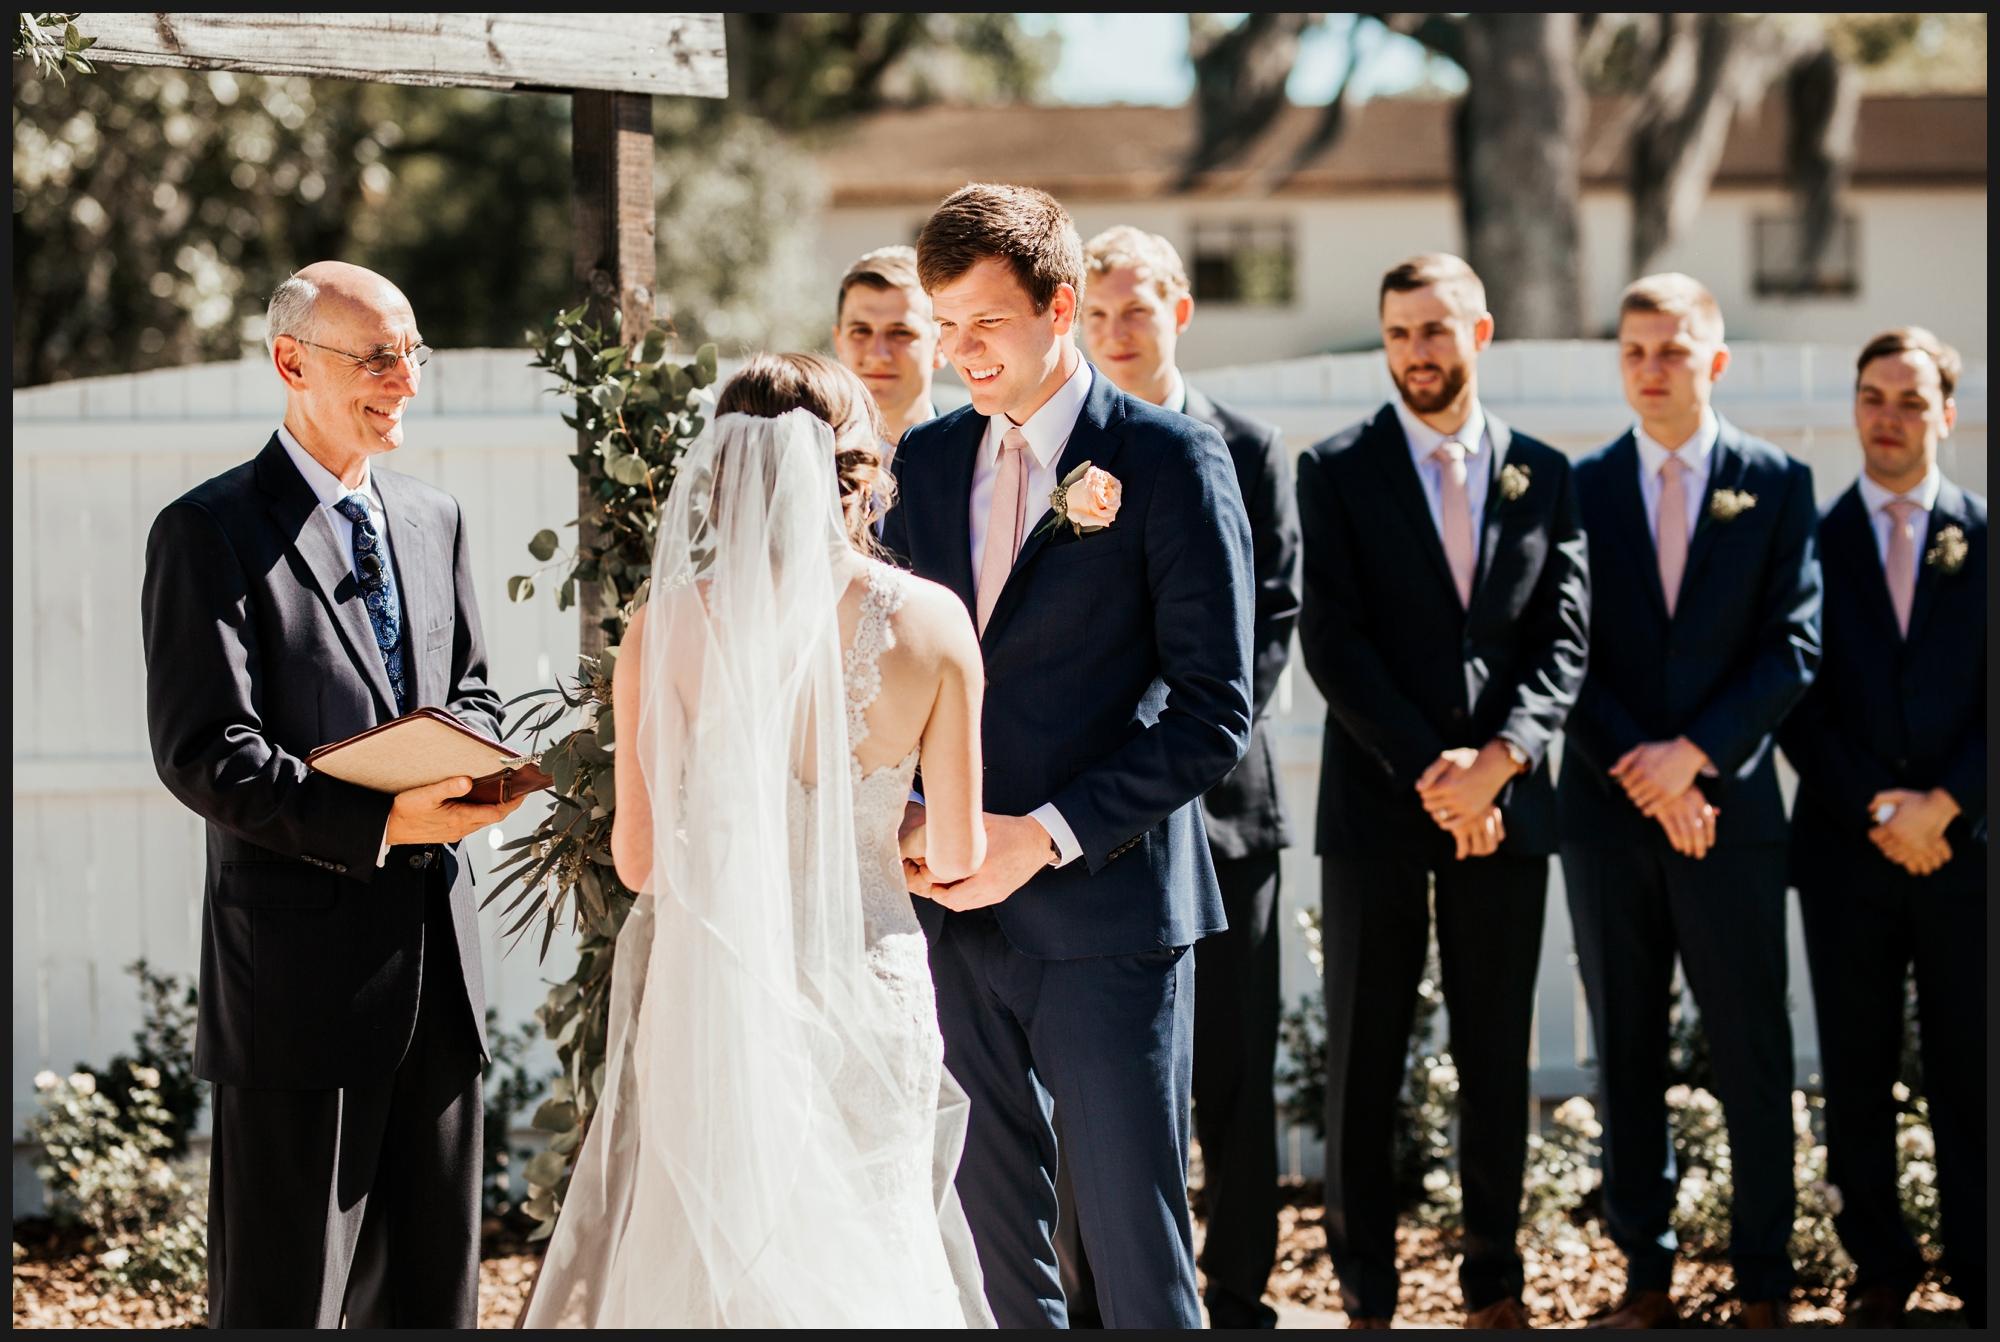 Orlando-Wedding-Photographer-destination-wedding-photographer-florida-wedding-photographer-bohemian-wedding-photographer_1749.jpg